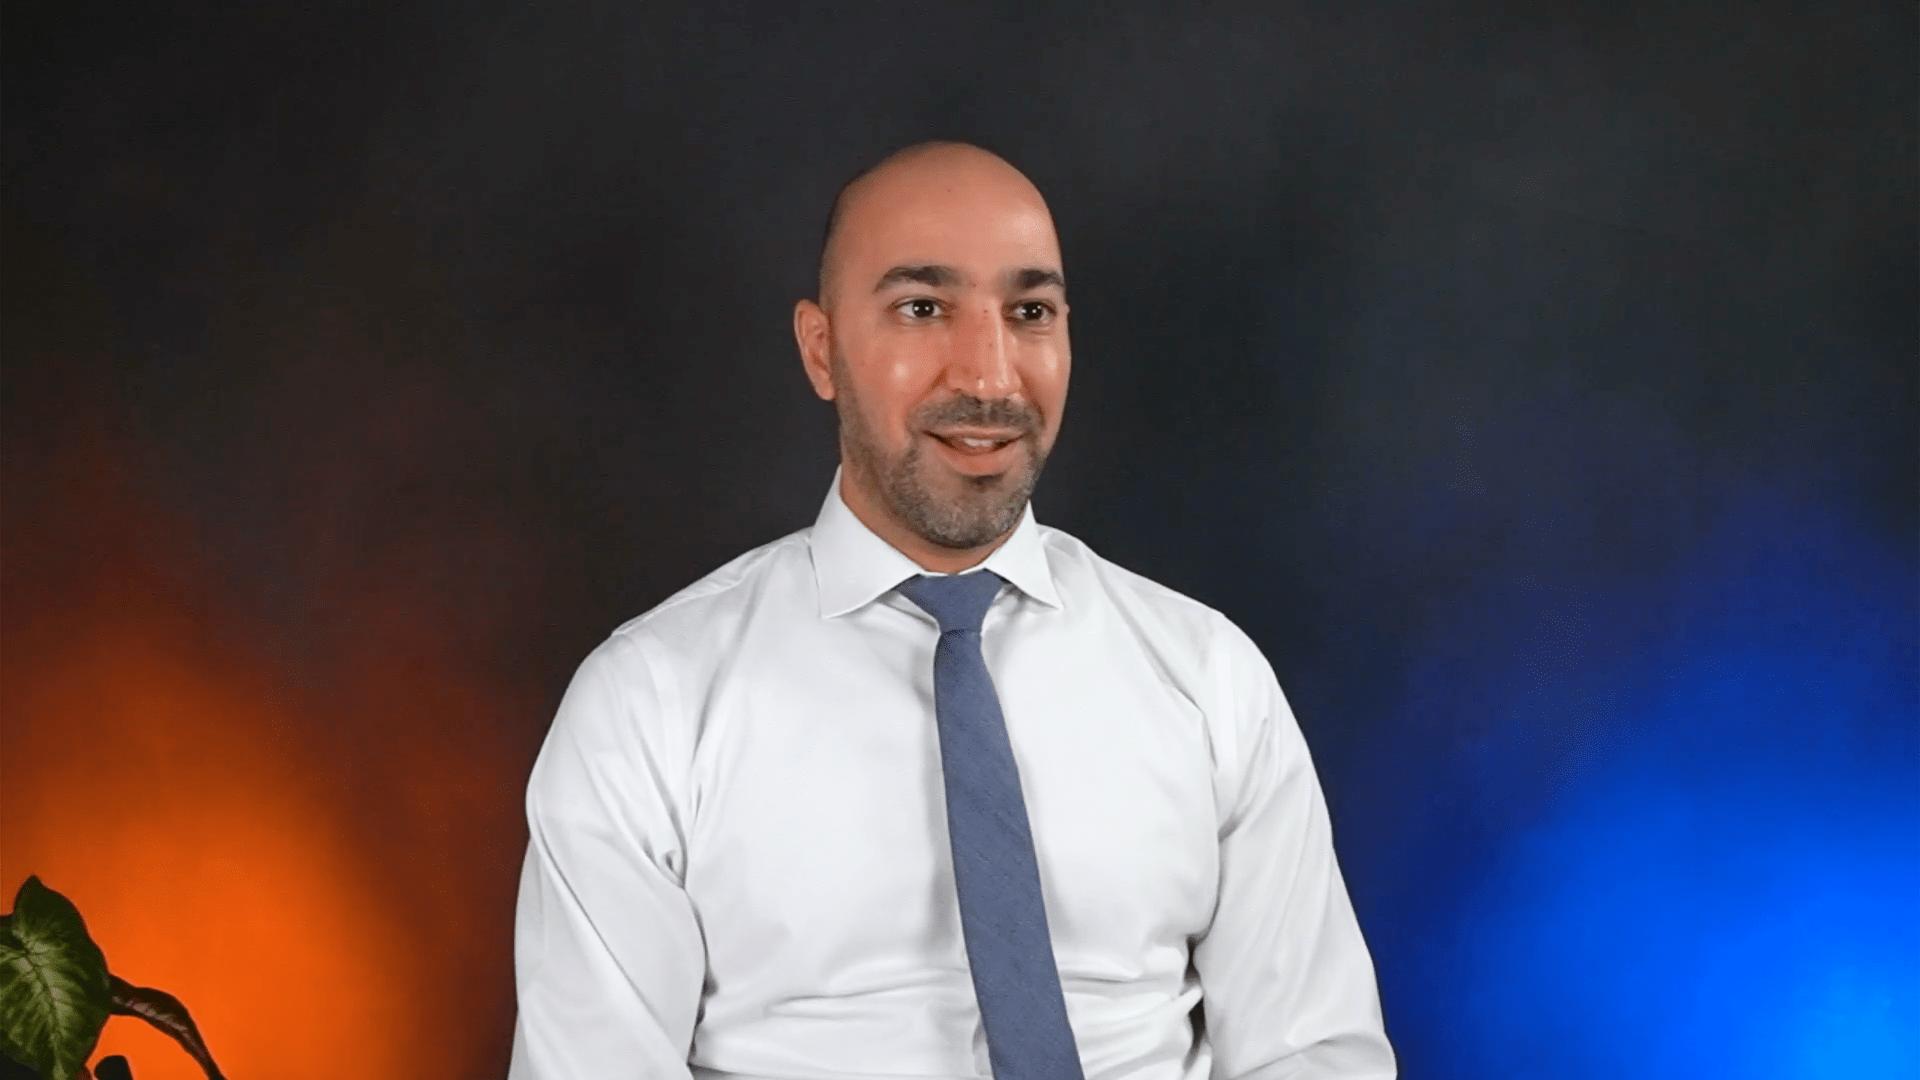 Abdullah Malkawi, MD, Associate Program Director